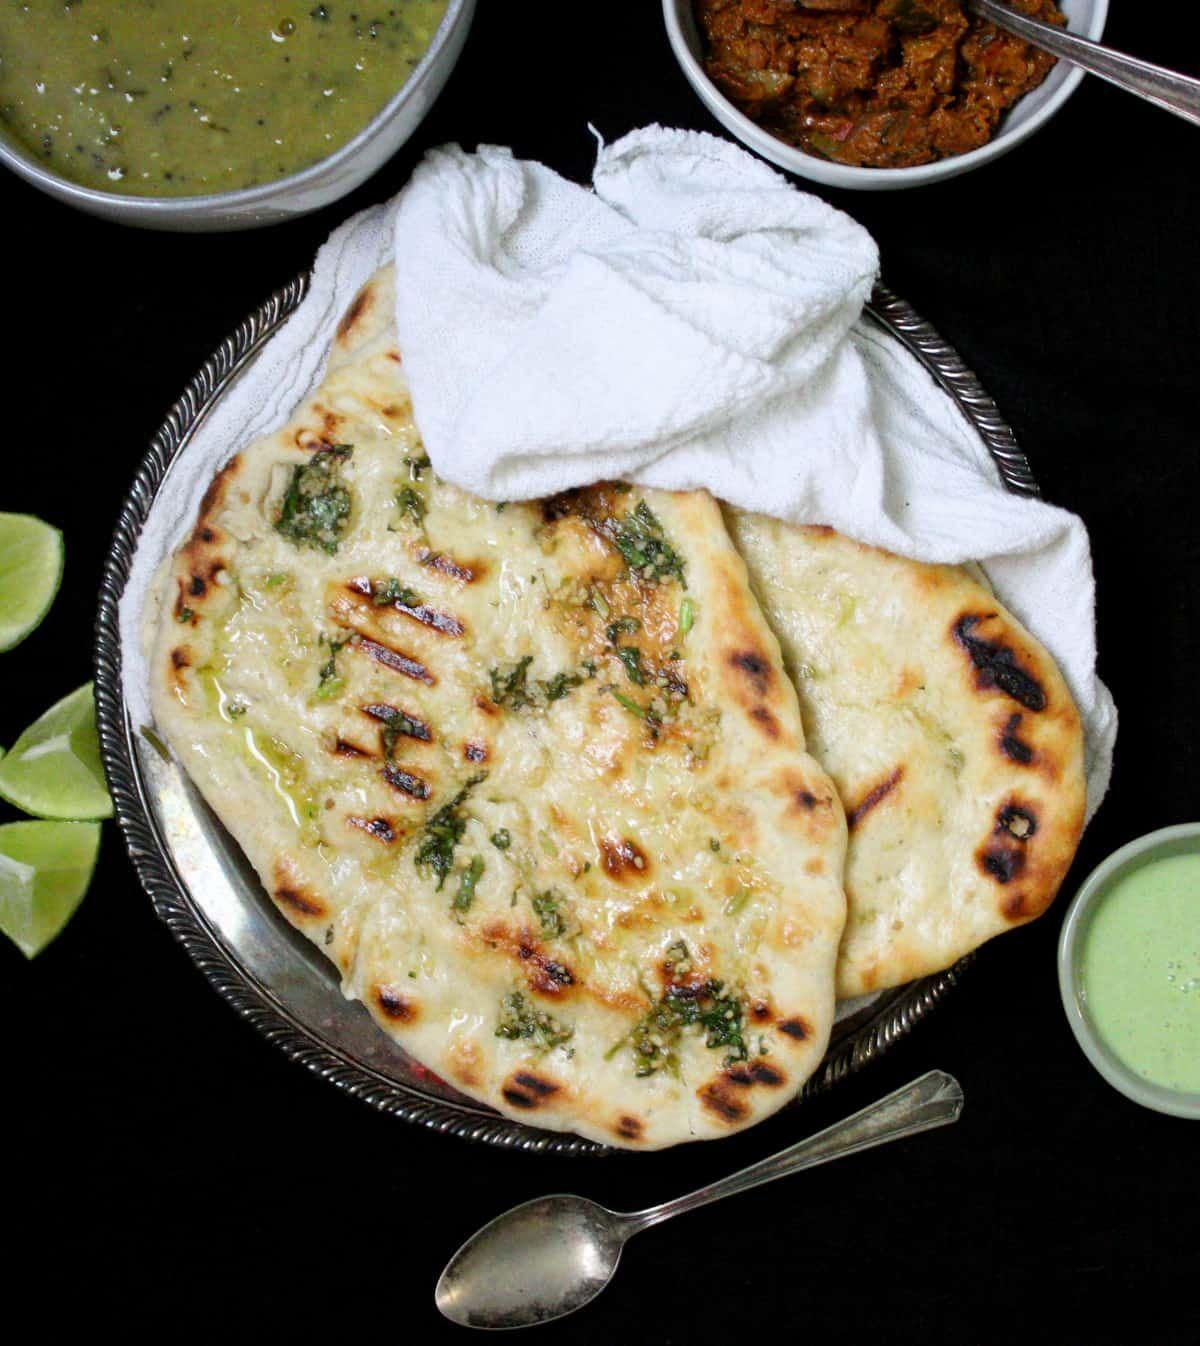 Easy Vegan Grilled Naan Recipe In 2020 Vegan Grilling Vegan Indian Recipes Tasty Bread Recipe